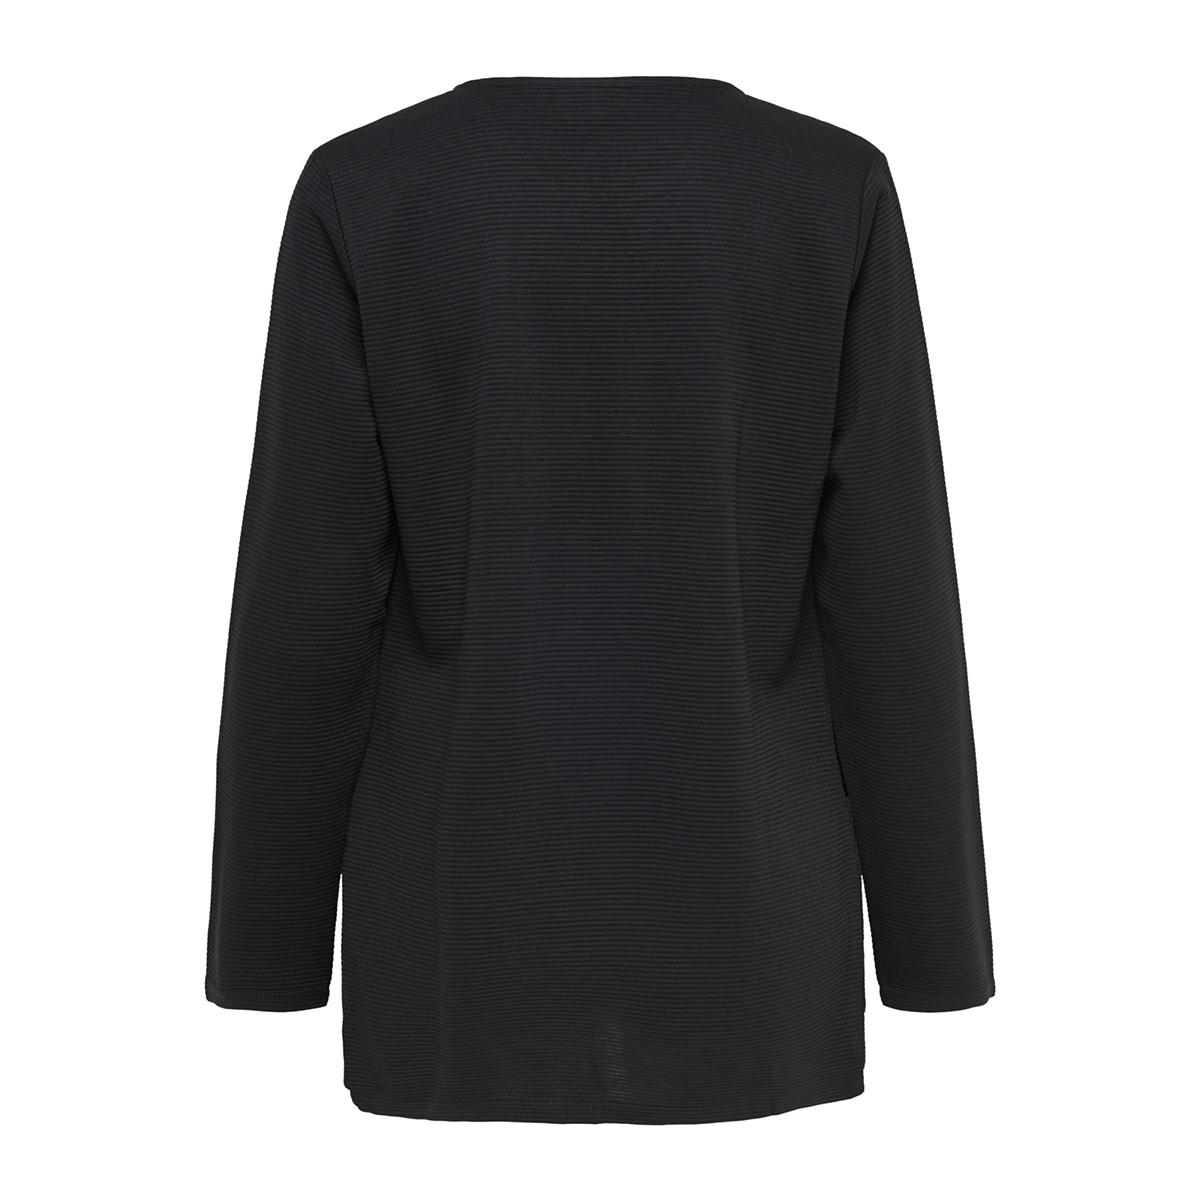 jdysaga l/s cardigan jrs noos 15154600 jacqueline de yong vest black